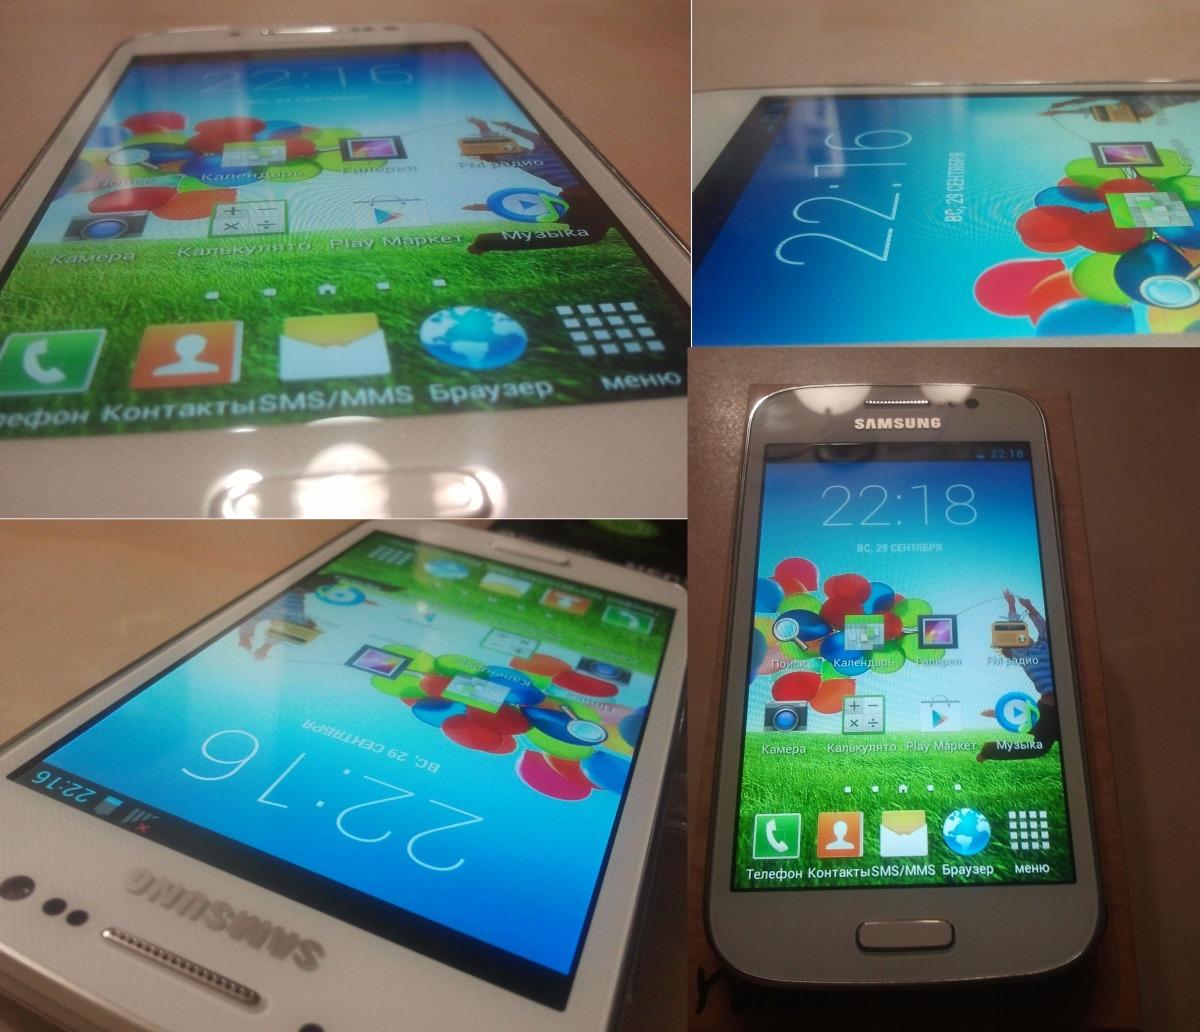 S4 mini y9190 mtk6572 android 4 2 2сим 3g gps wi fi ips 4 3